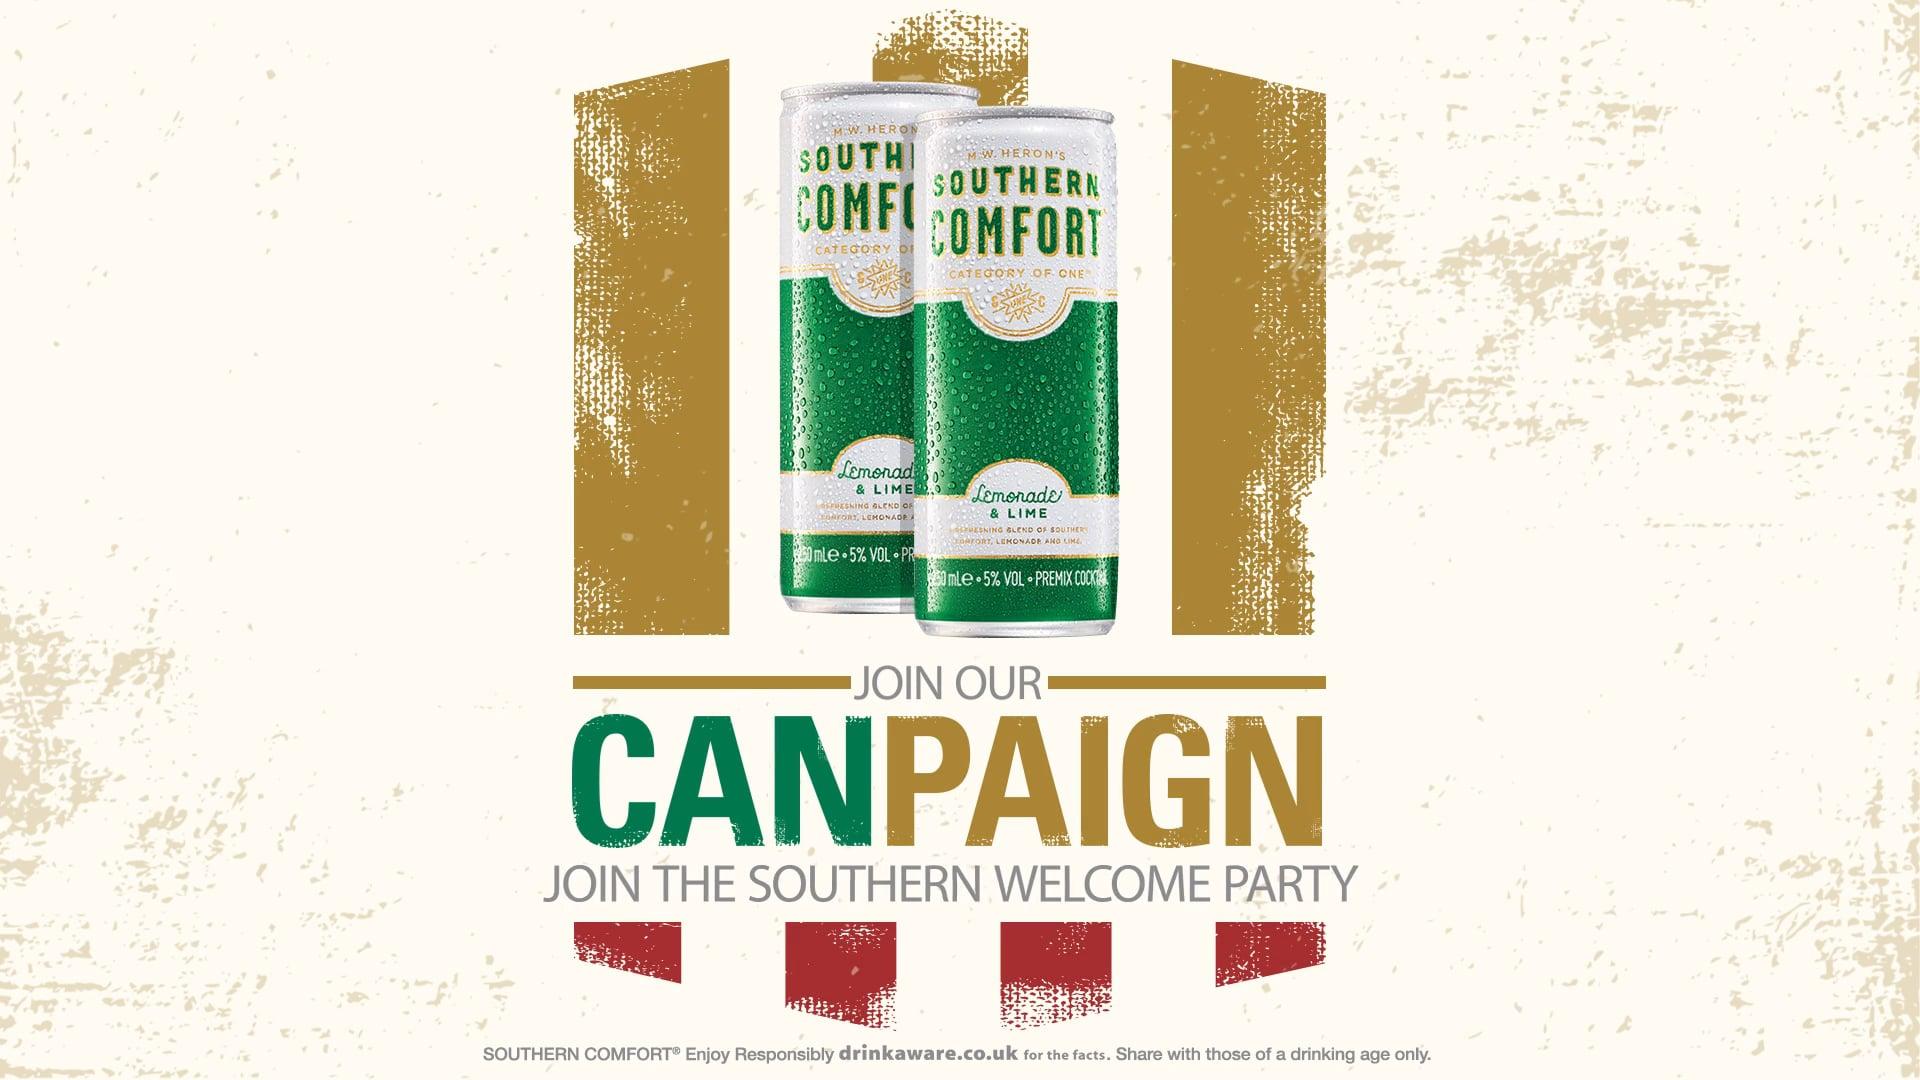 Southern Comfort CanPaign Recap